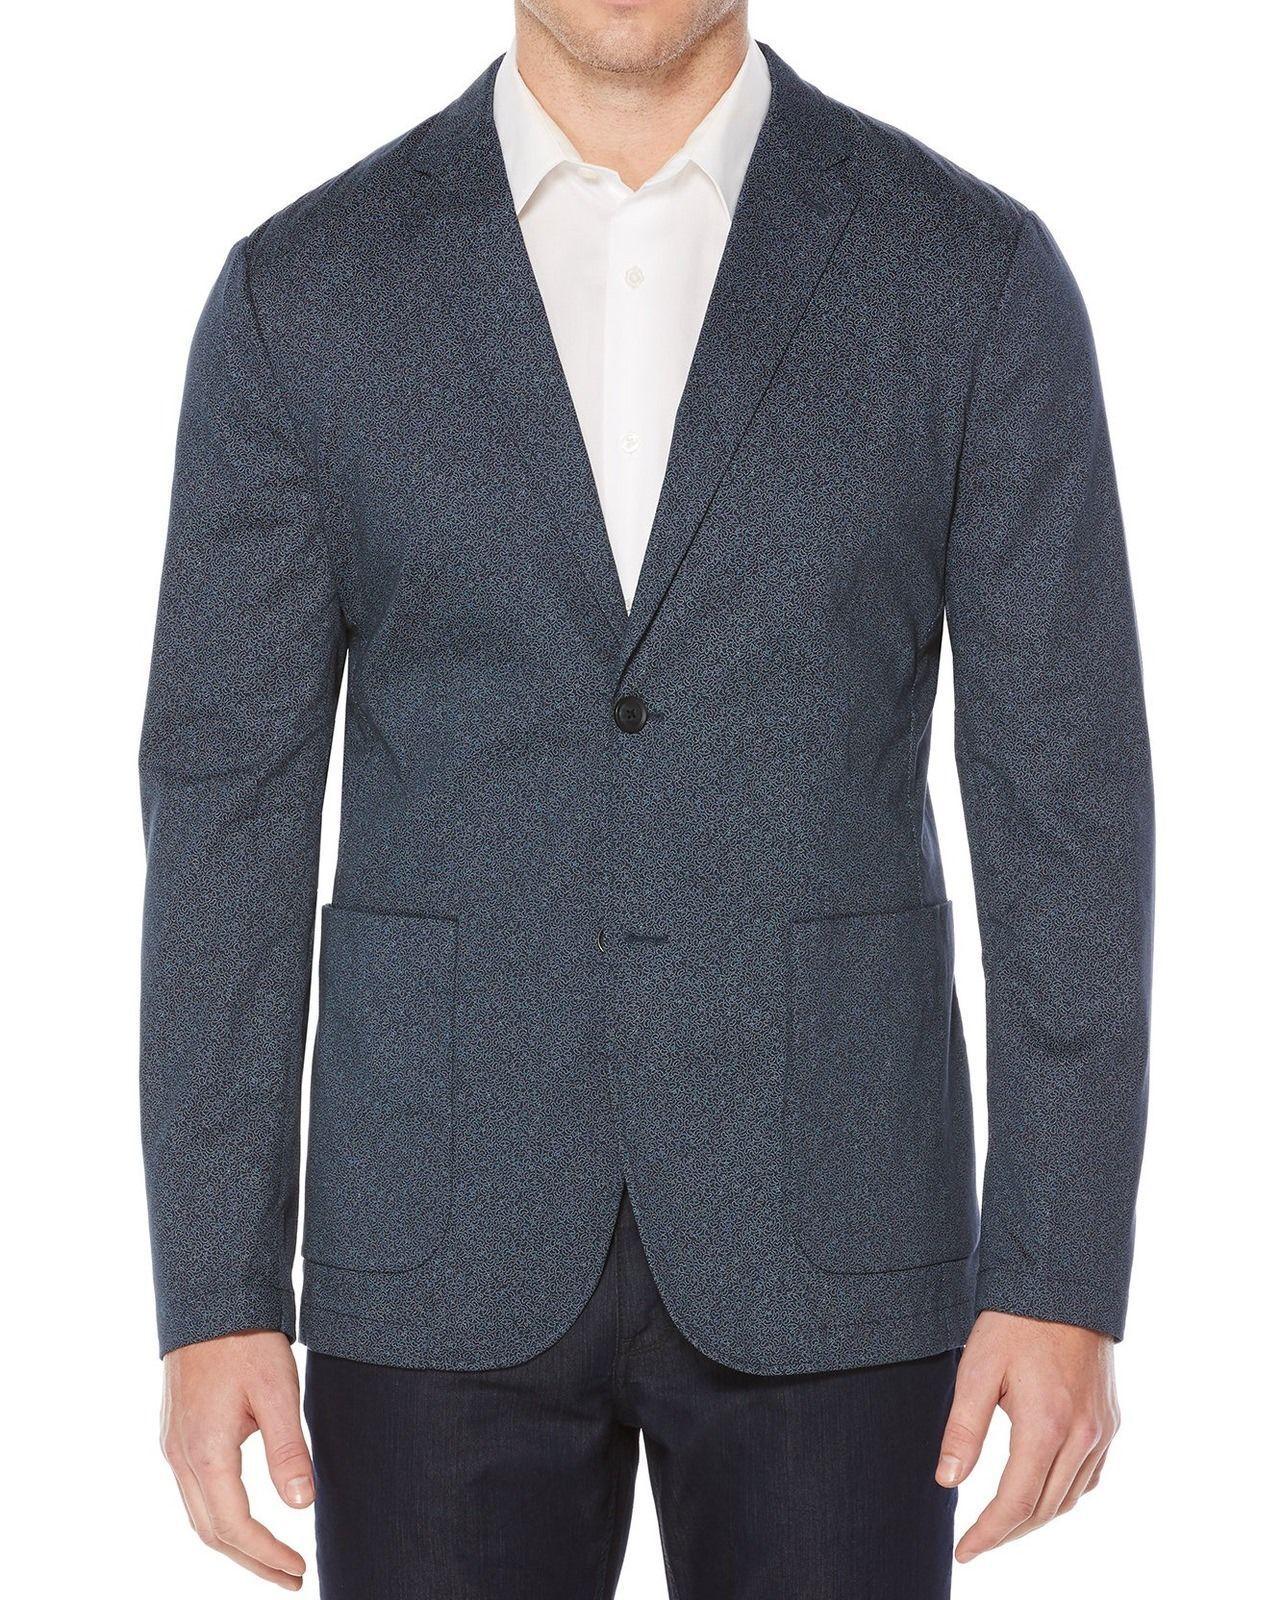 Perry Ellis bluee Men's 40REG Two-button Scribble-print Sport Coat,Size 40